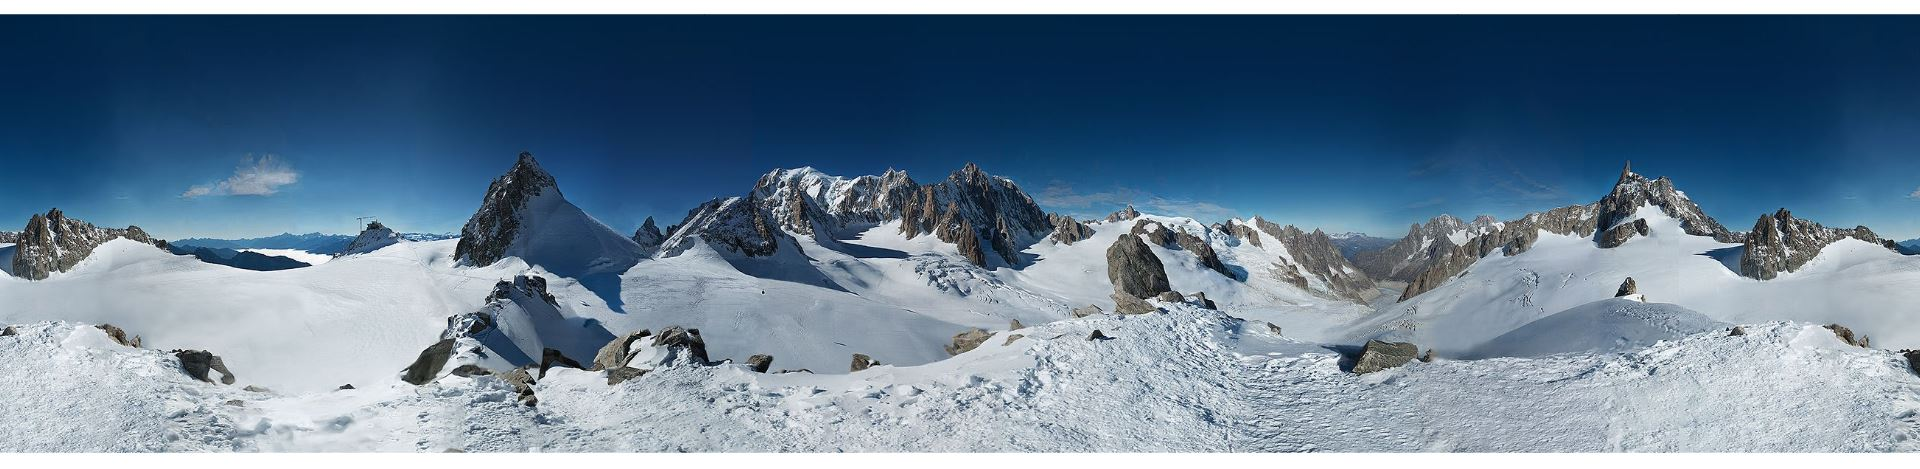 Mont Blanc dağı forum.sonyturk.com.jpeg